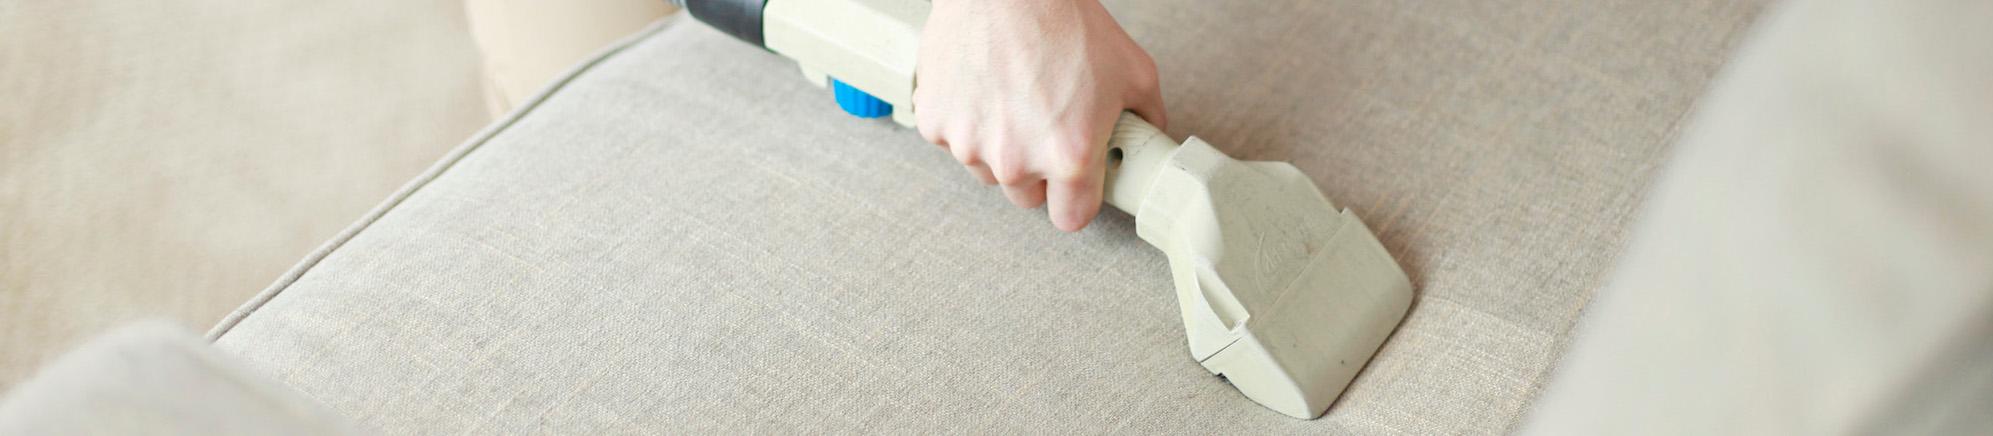 Opening In Austin Area Zerorez Carpet Cleaning